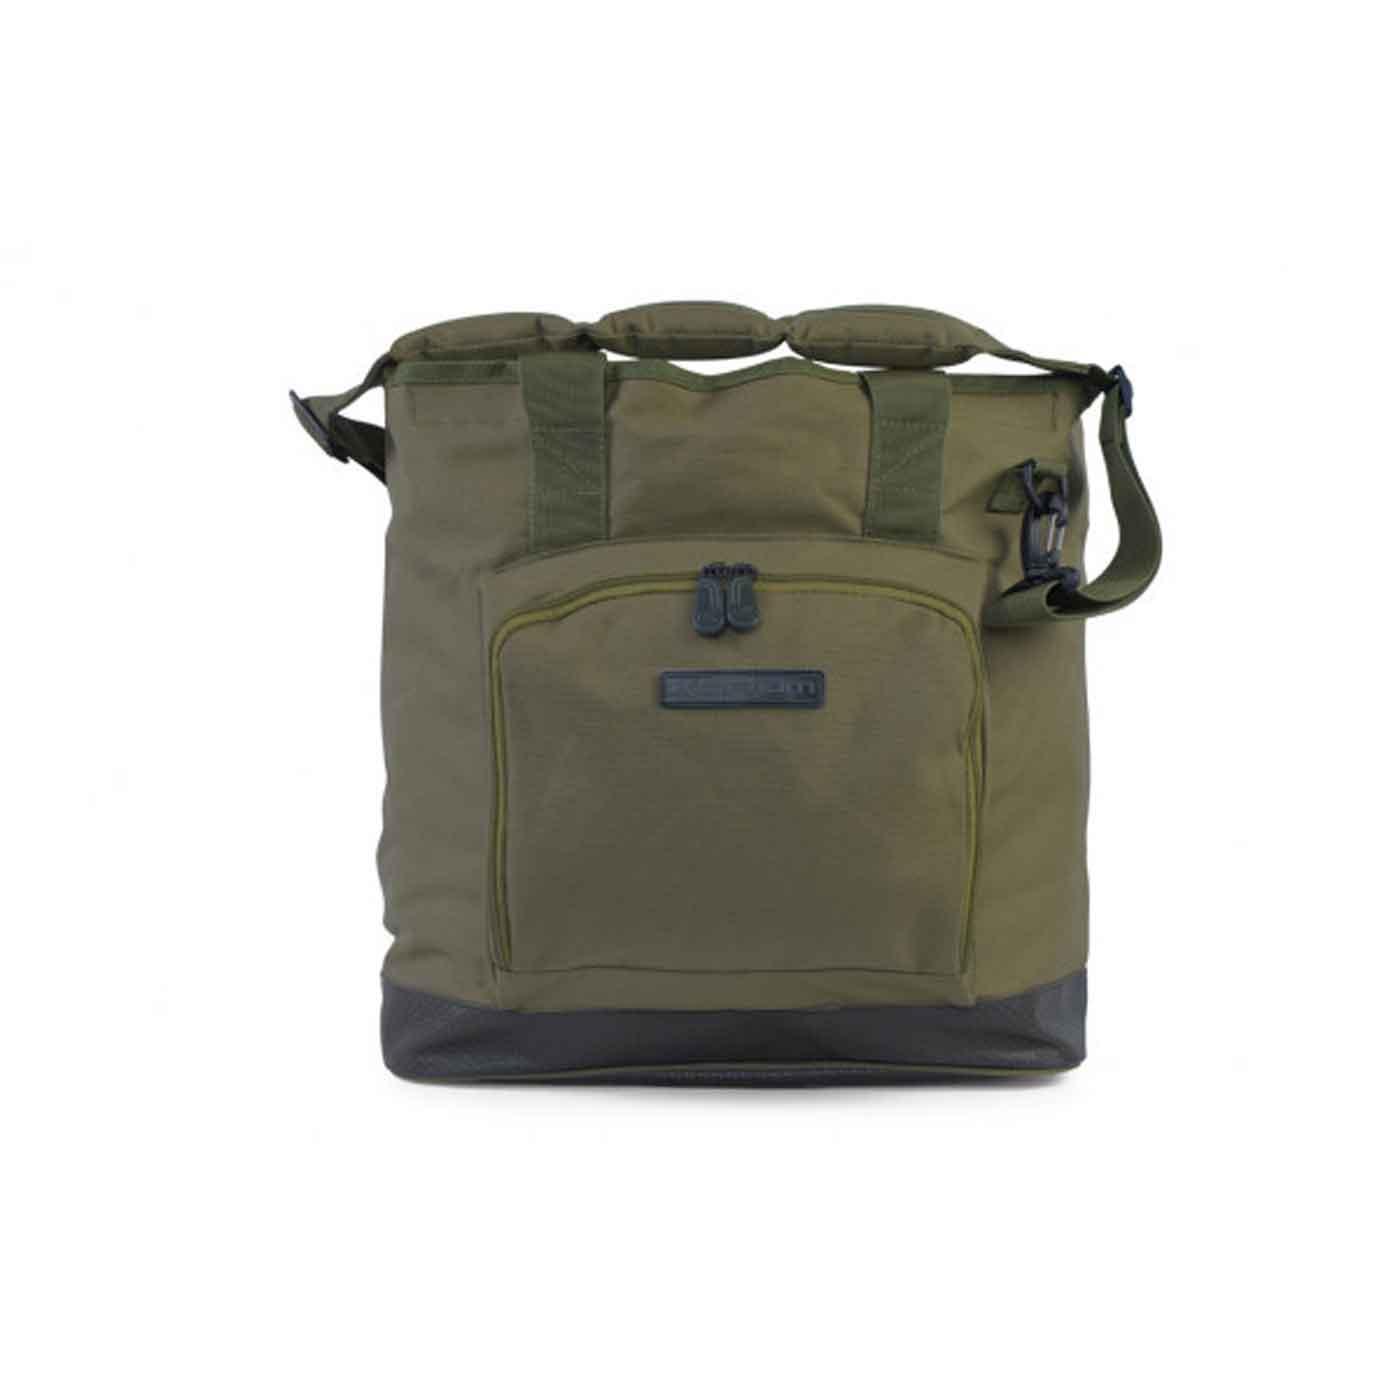 Korum ITM Tackle & Bait Bag